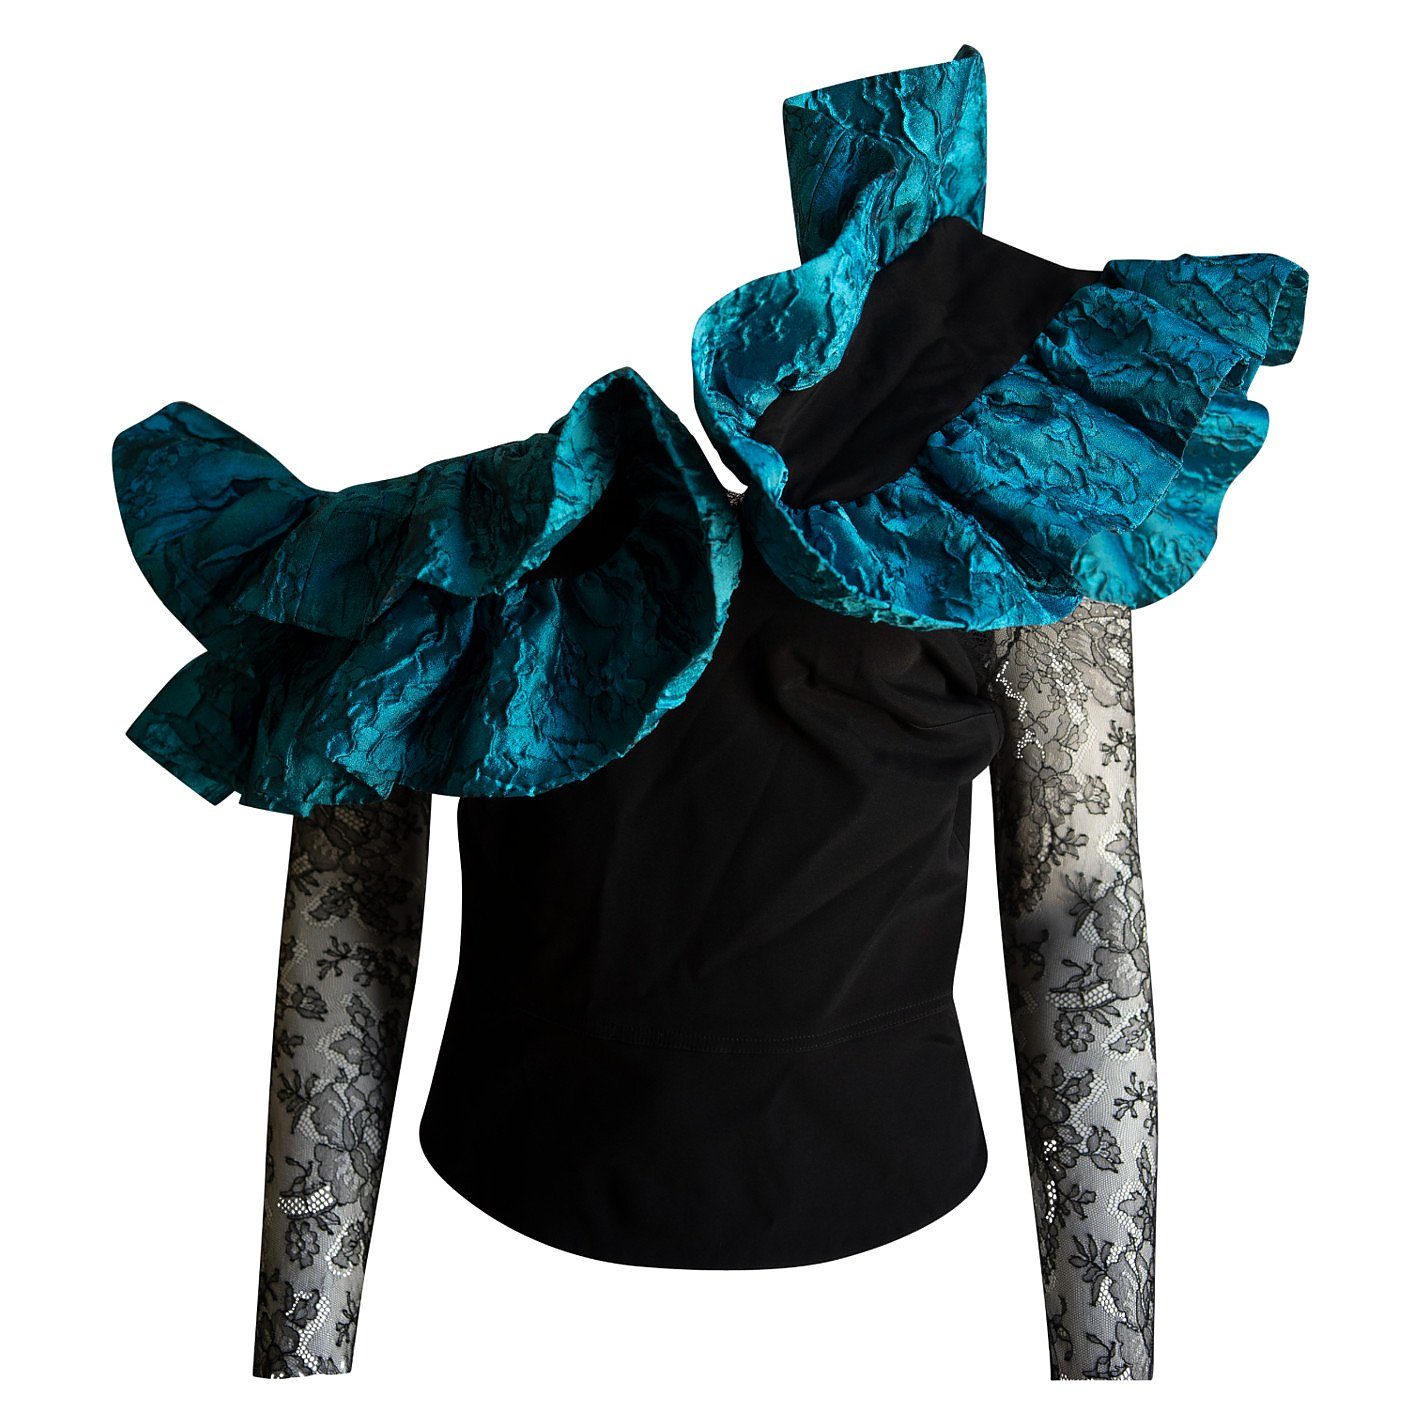 Emilio De La Morena Bonded Silk Ruffle-Strap Top